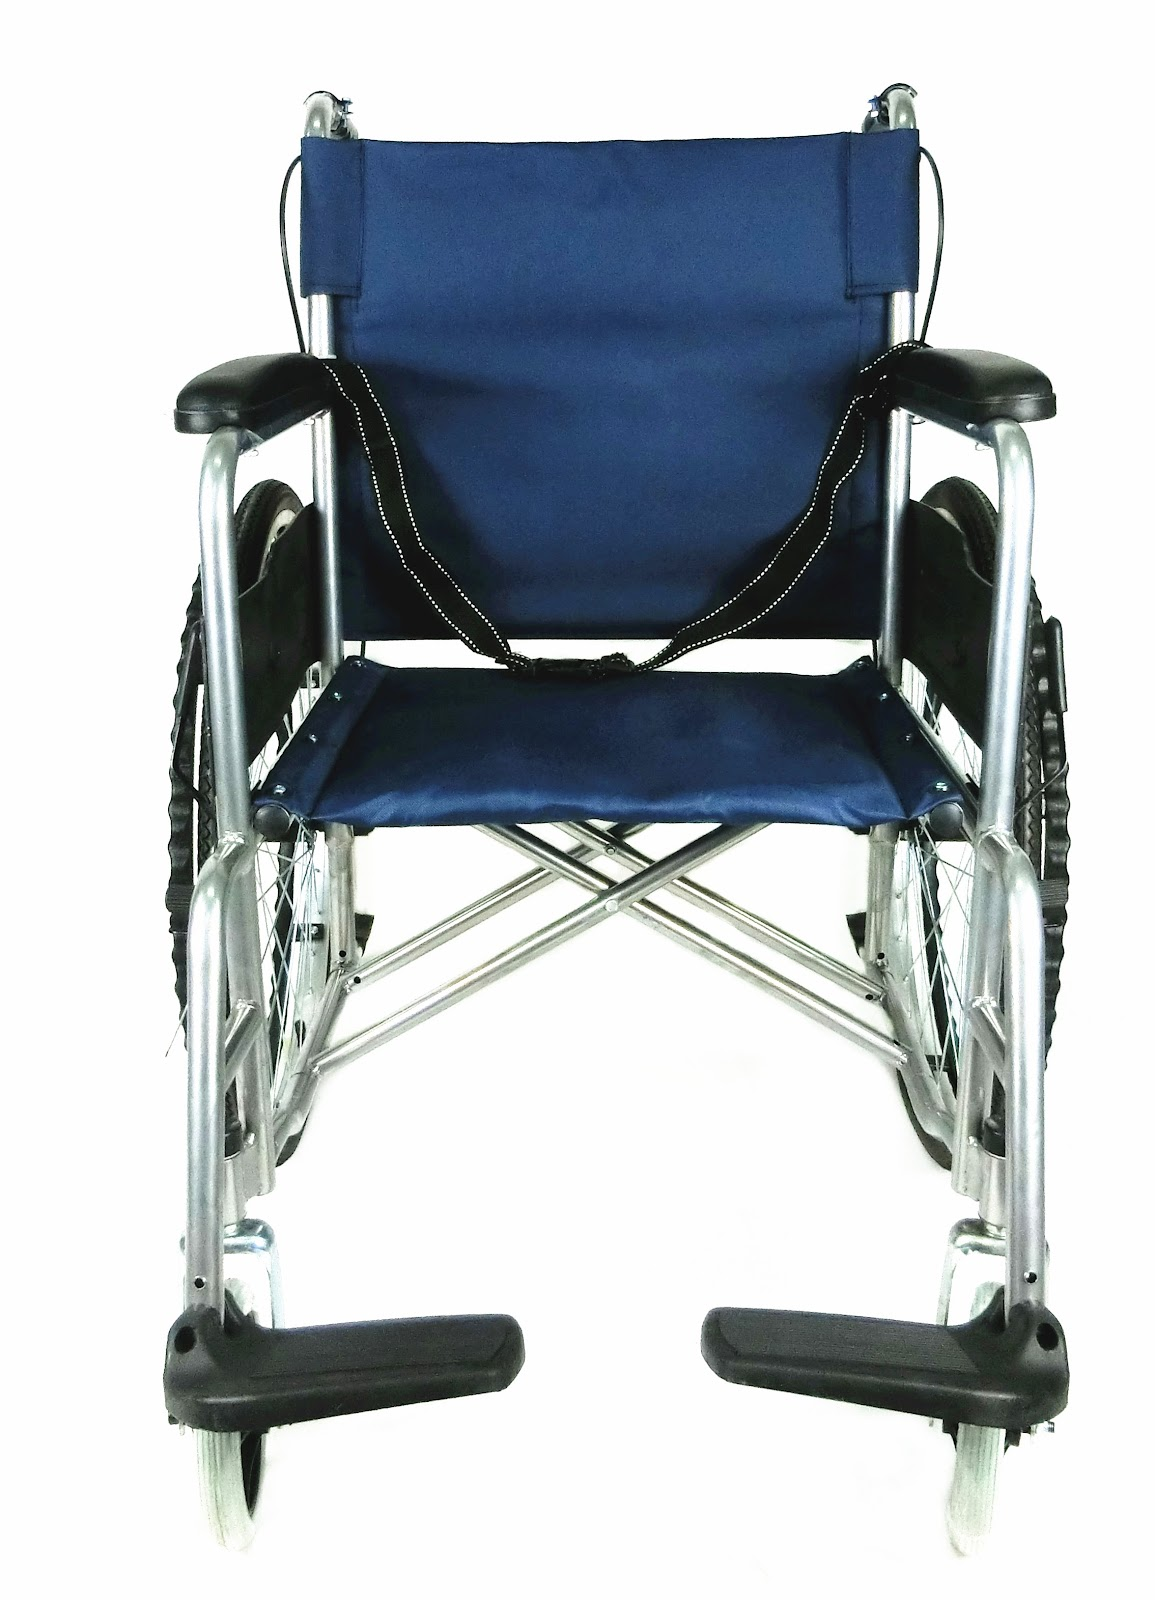 shower chair malaysia lowes plastic adirondack chairs economic wheelchair kerusi roda ekon end 7 27 2017 9 15 am